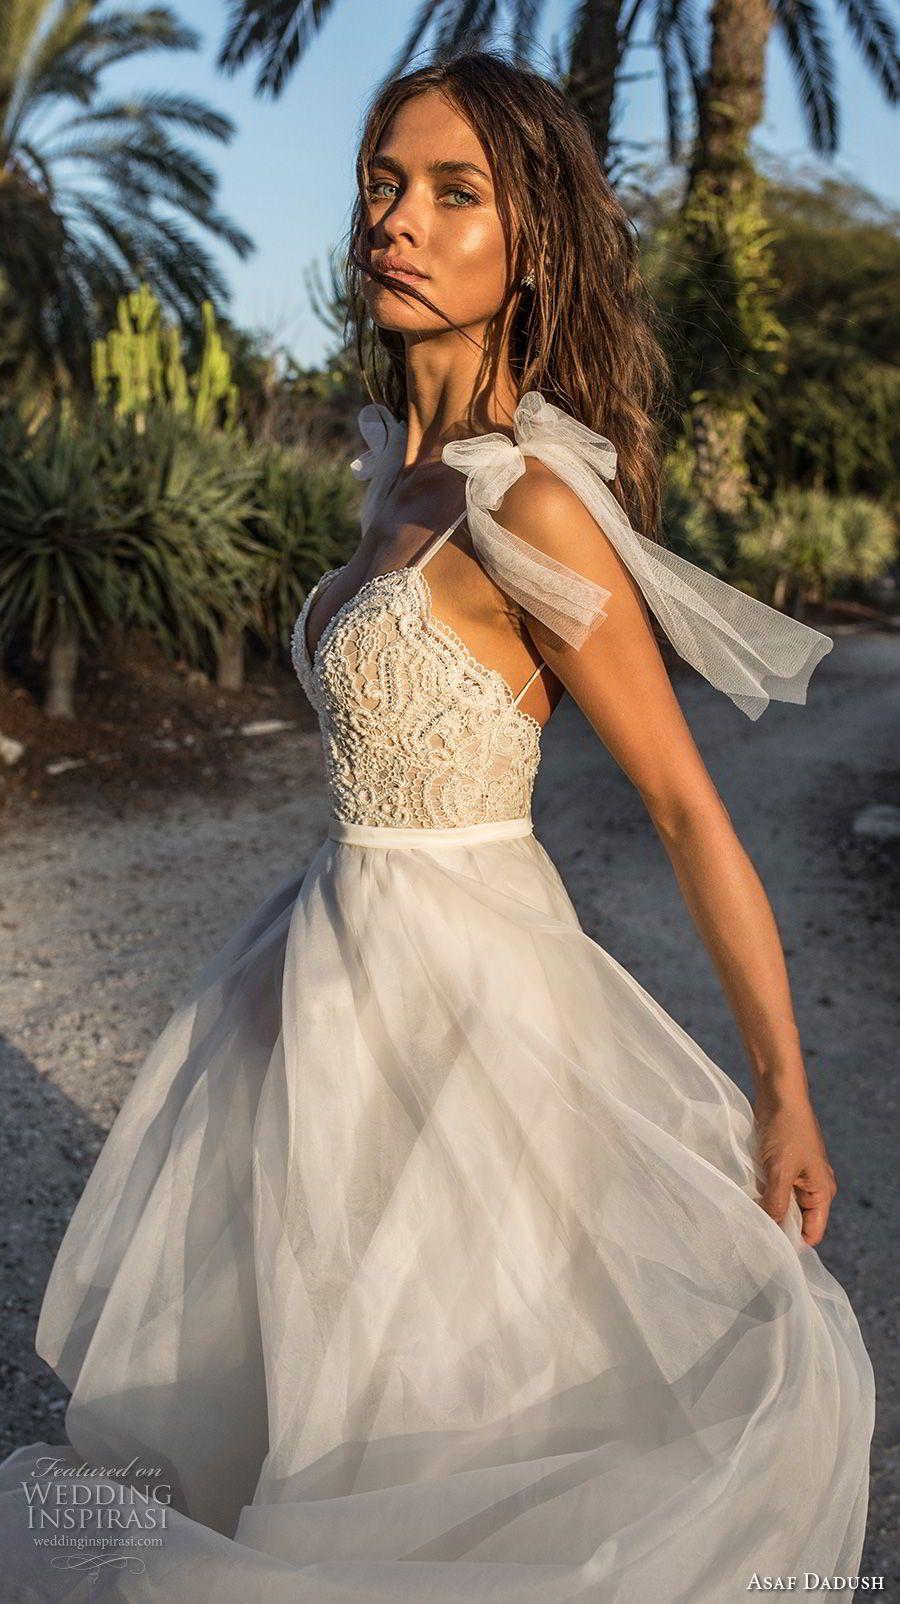 Asaf dadush wedding dresses wedding pinterest wedding